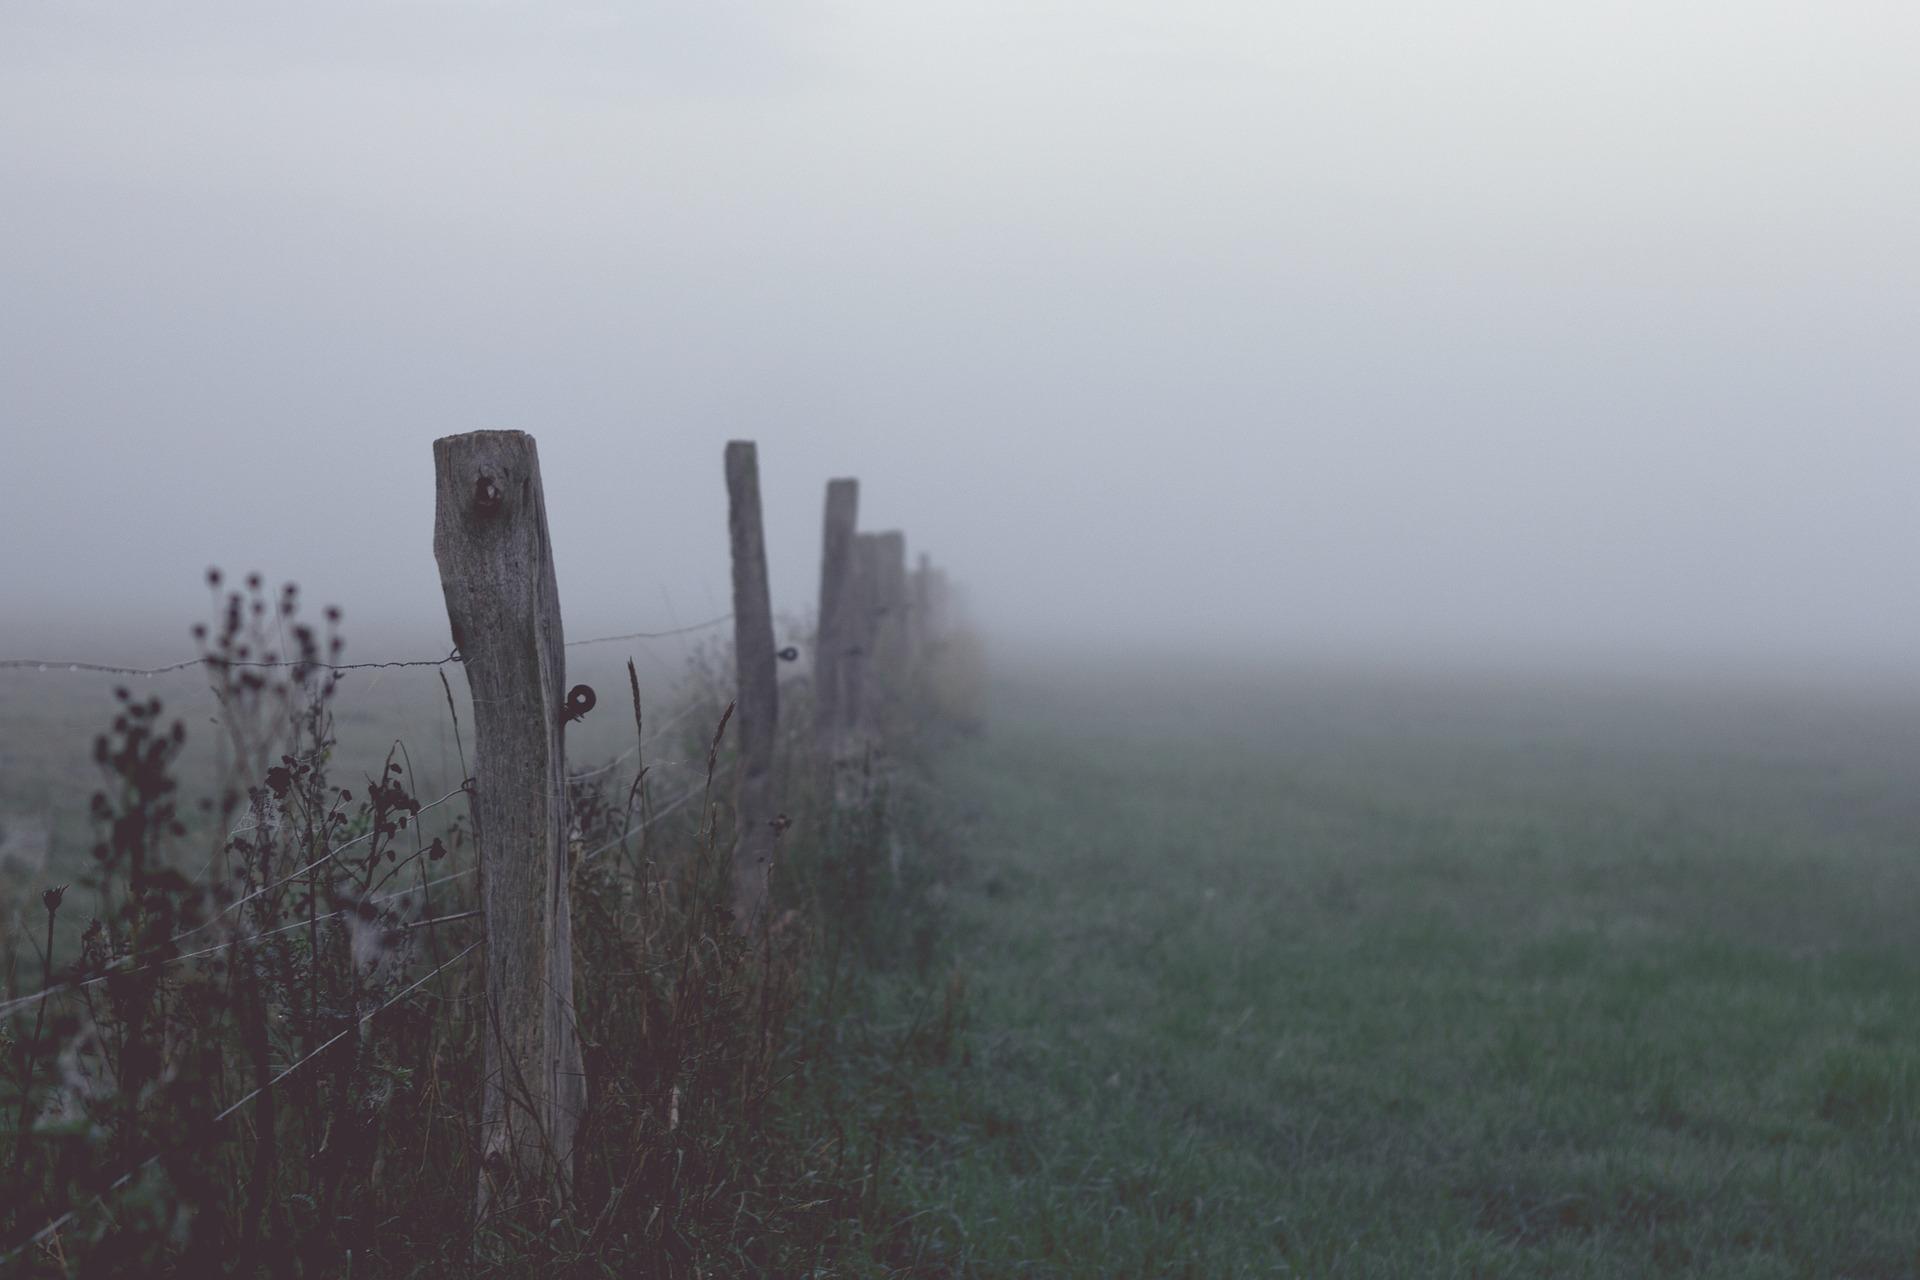 fog-1494431_1920.jpg